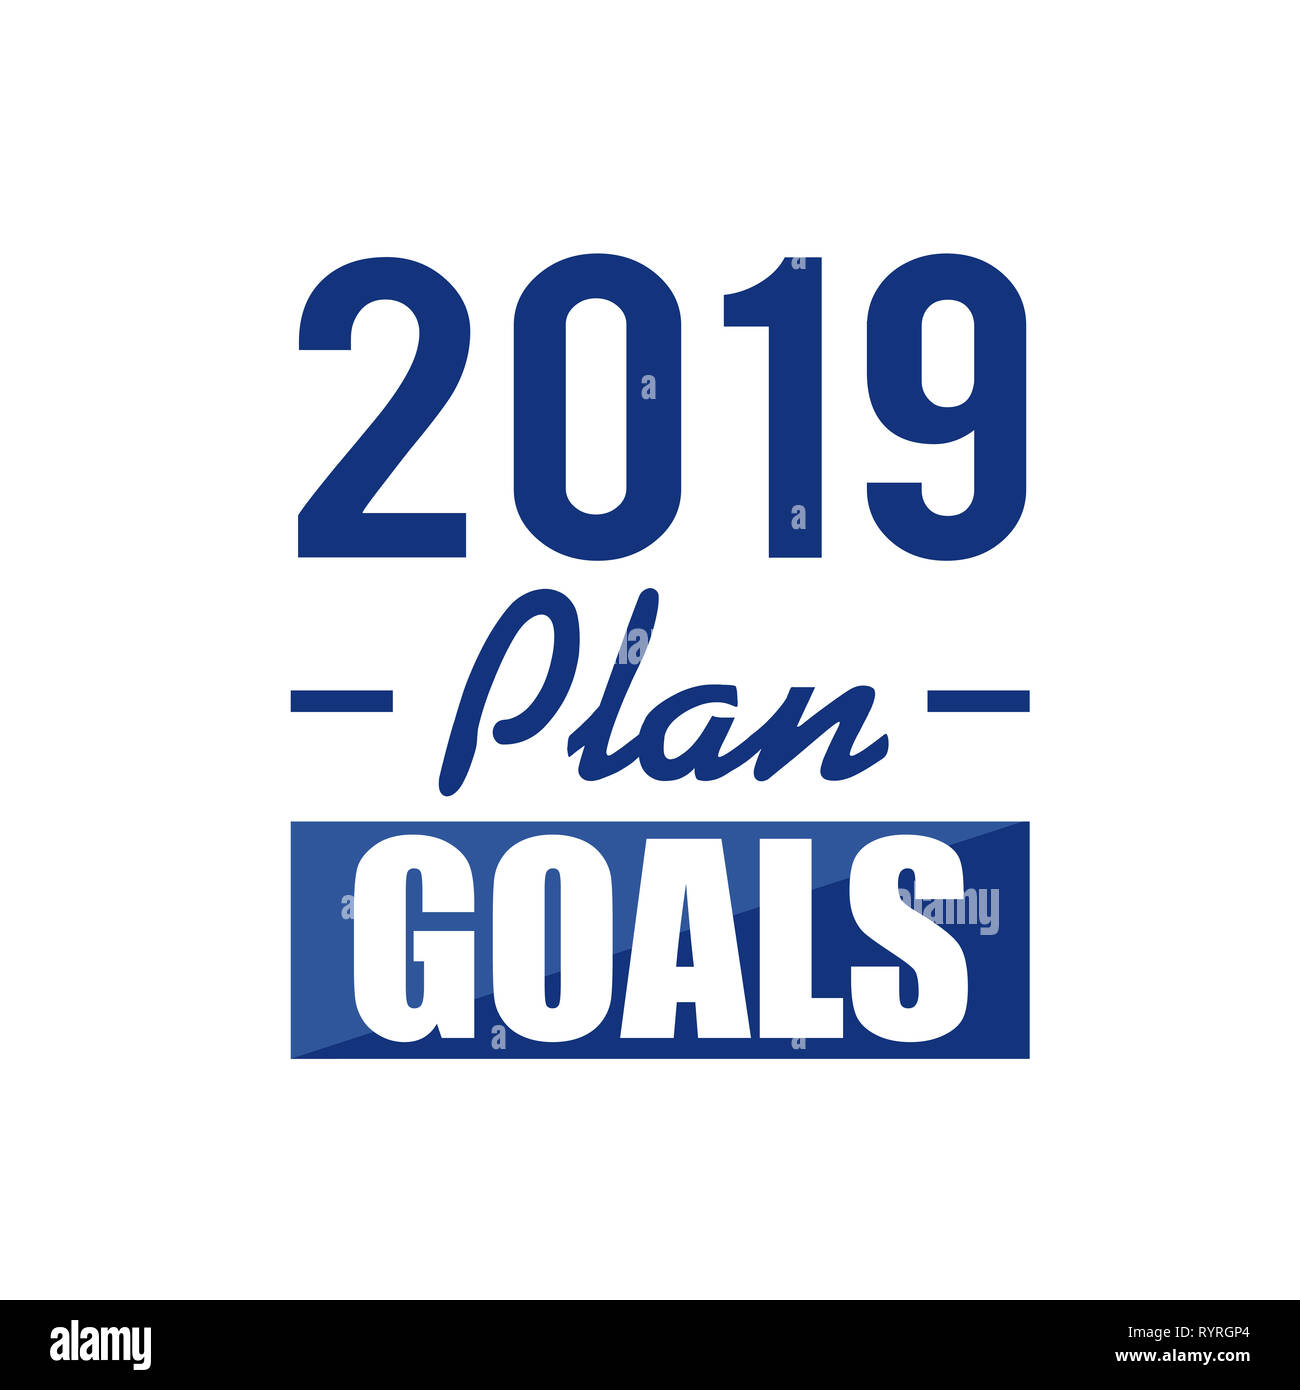 2019 plan goals text sign concept illustration design over white Stock Photo